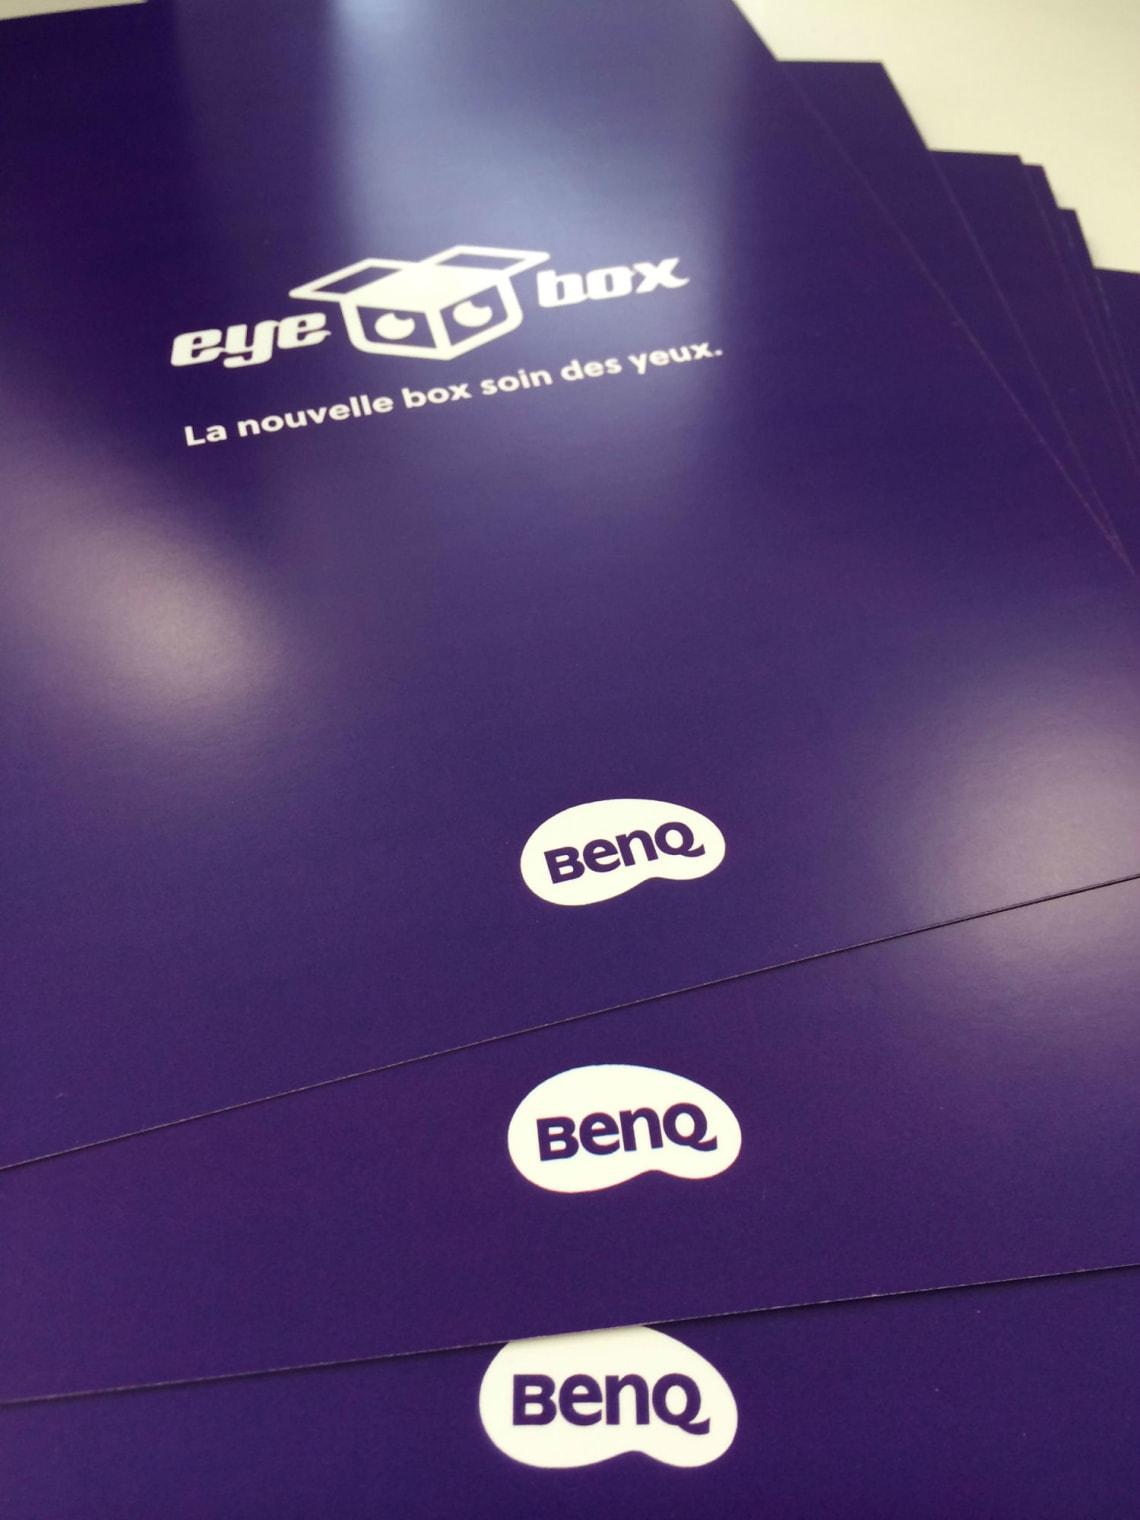 BenQ – Eyebox Conception,Direction Artistique,Identité,Social Media,Print,Logo